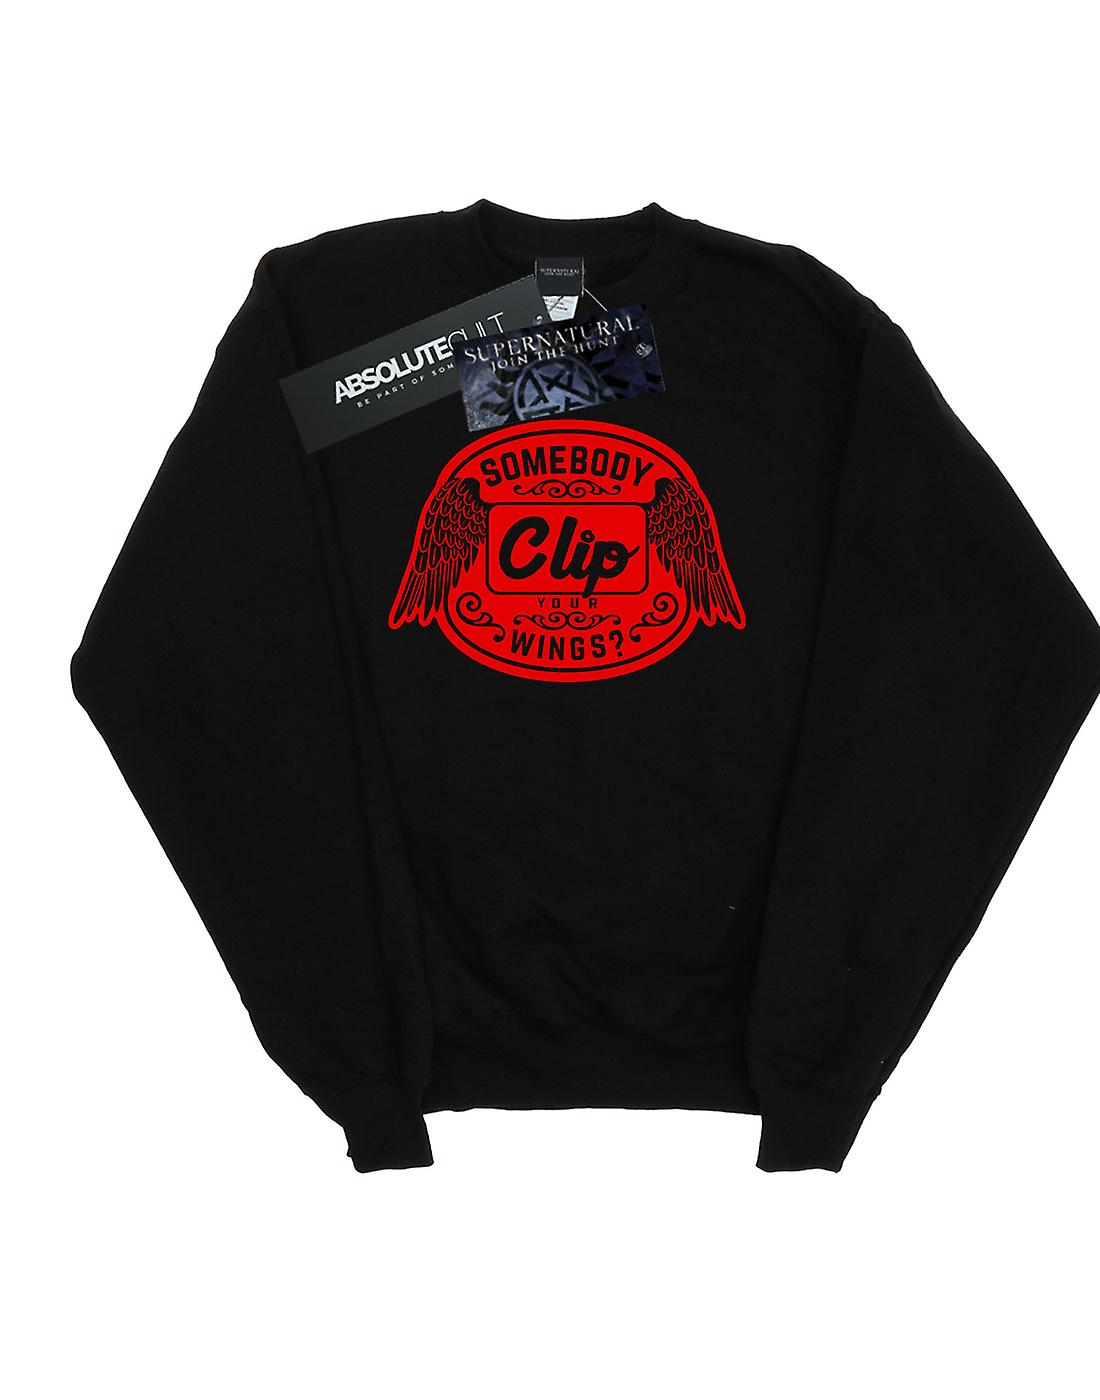 Supernatural Women's Clip Your Wings Sweatshirt